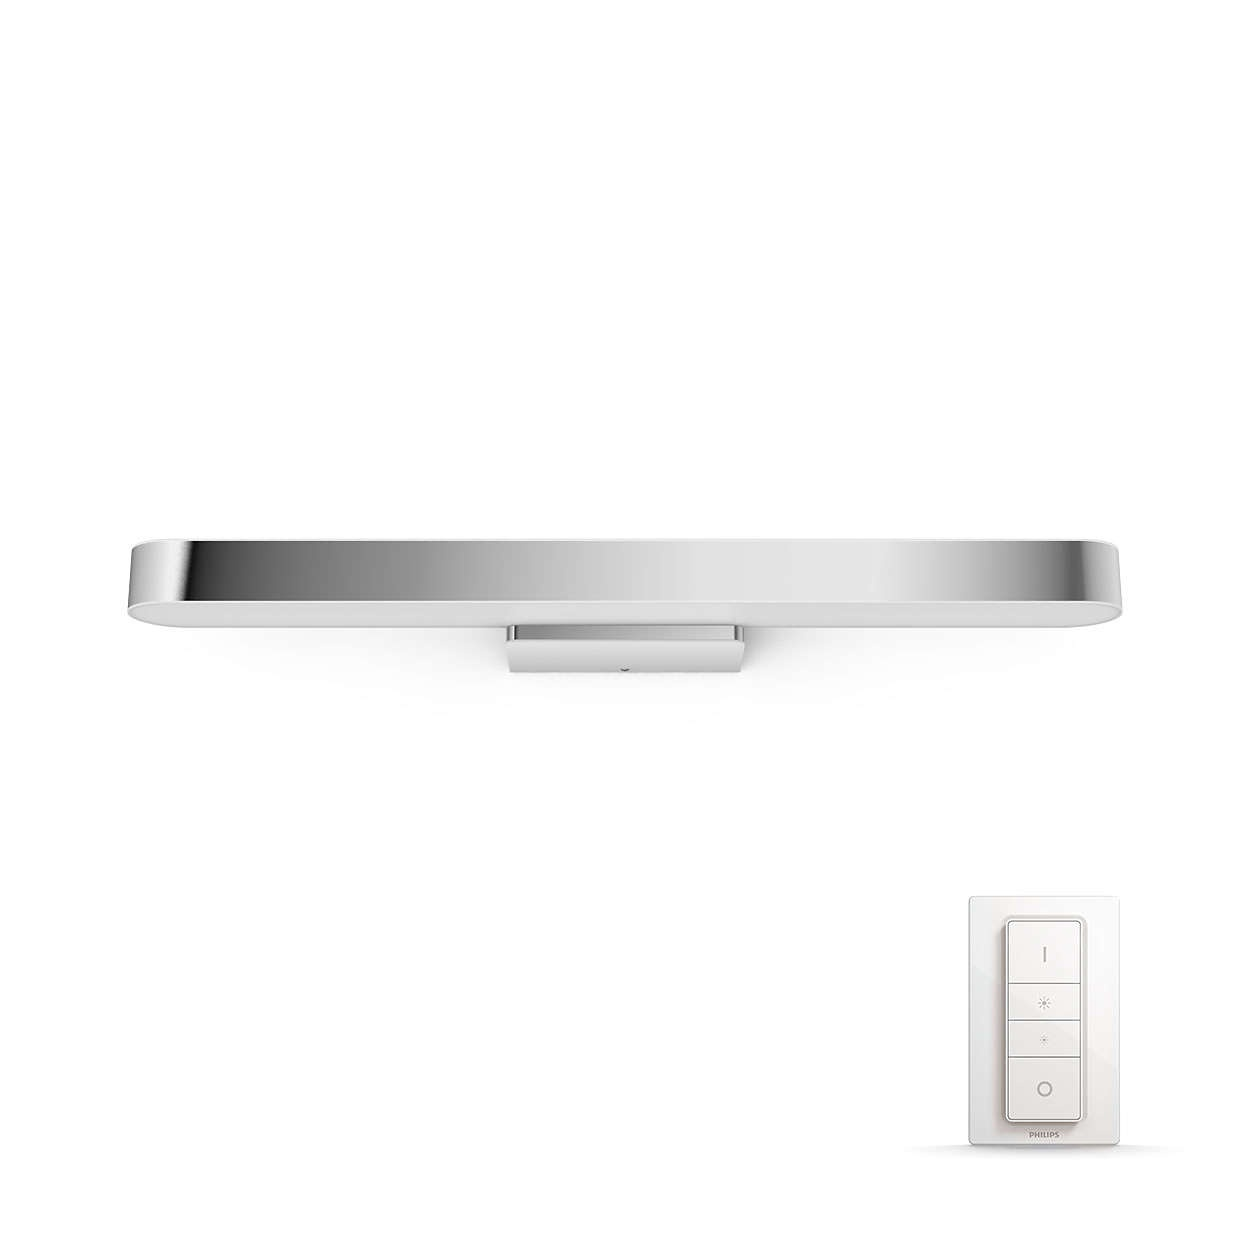 PHILIPS Adore Nástěnné svítidlo, Hue White ambiance, 230V, 1x40W integr.LED, Chrom